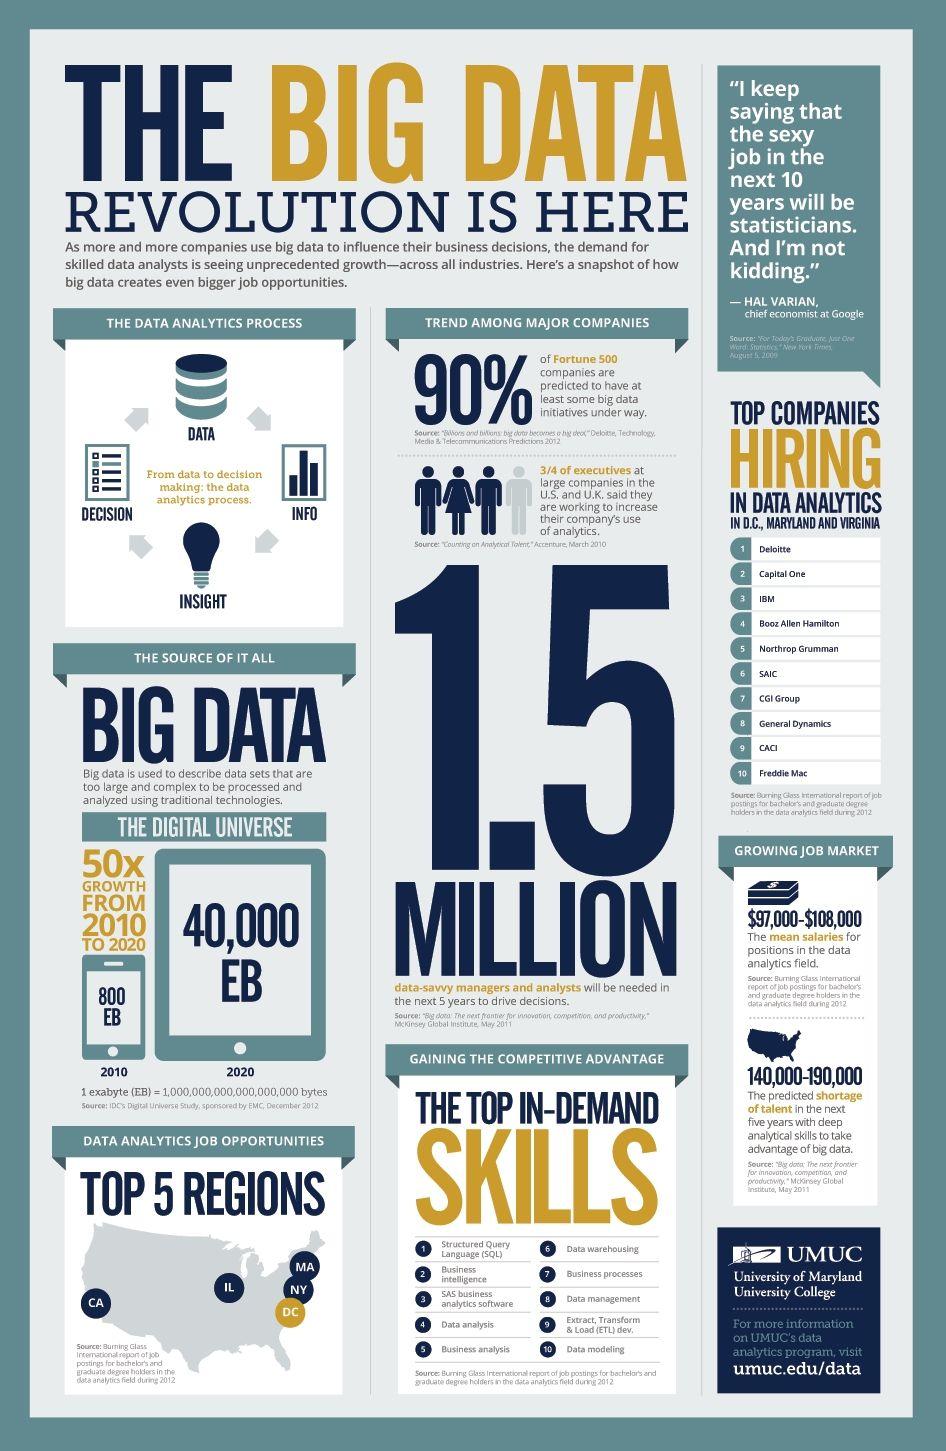 The Big Data Storyboard! http://itusers.wordpress.com/